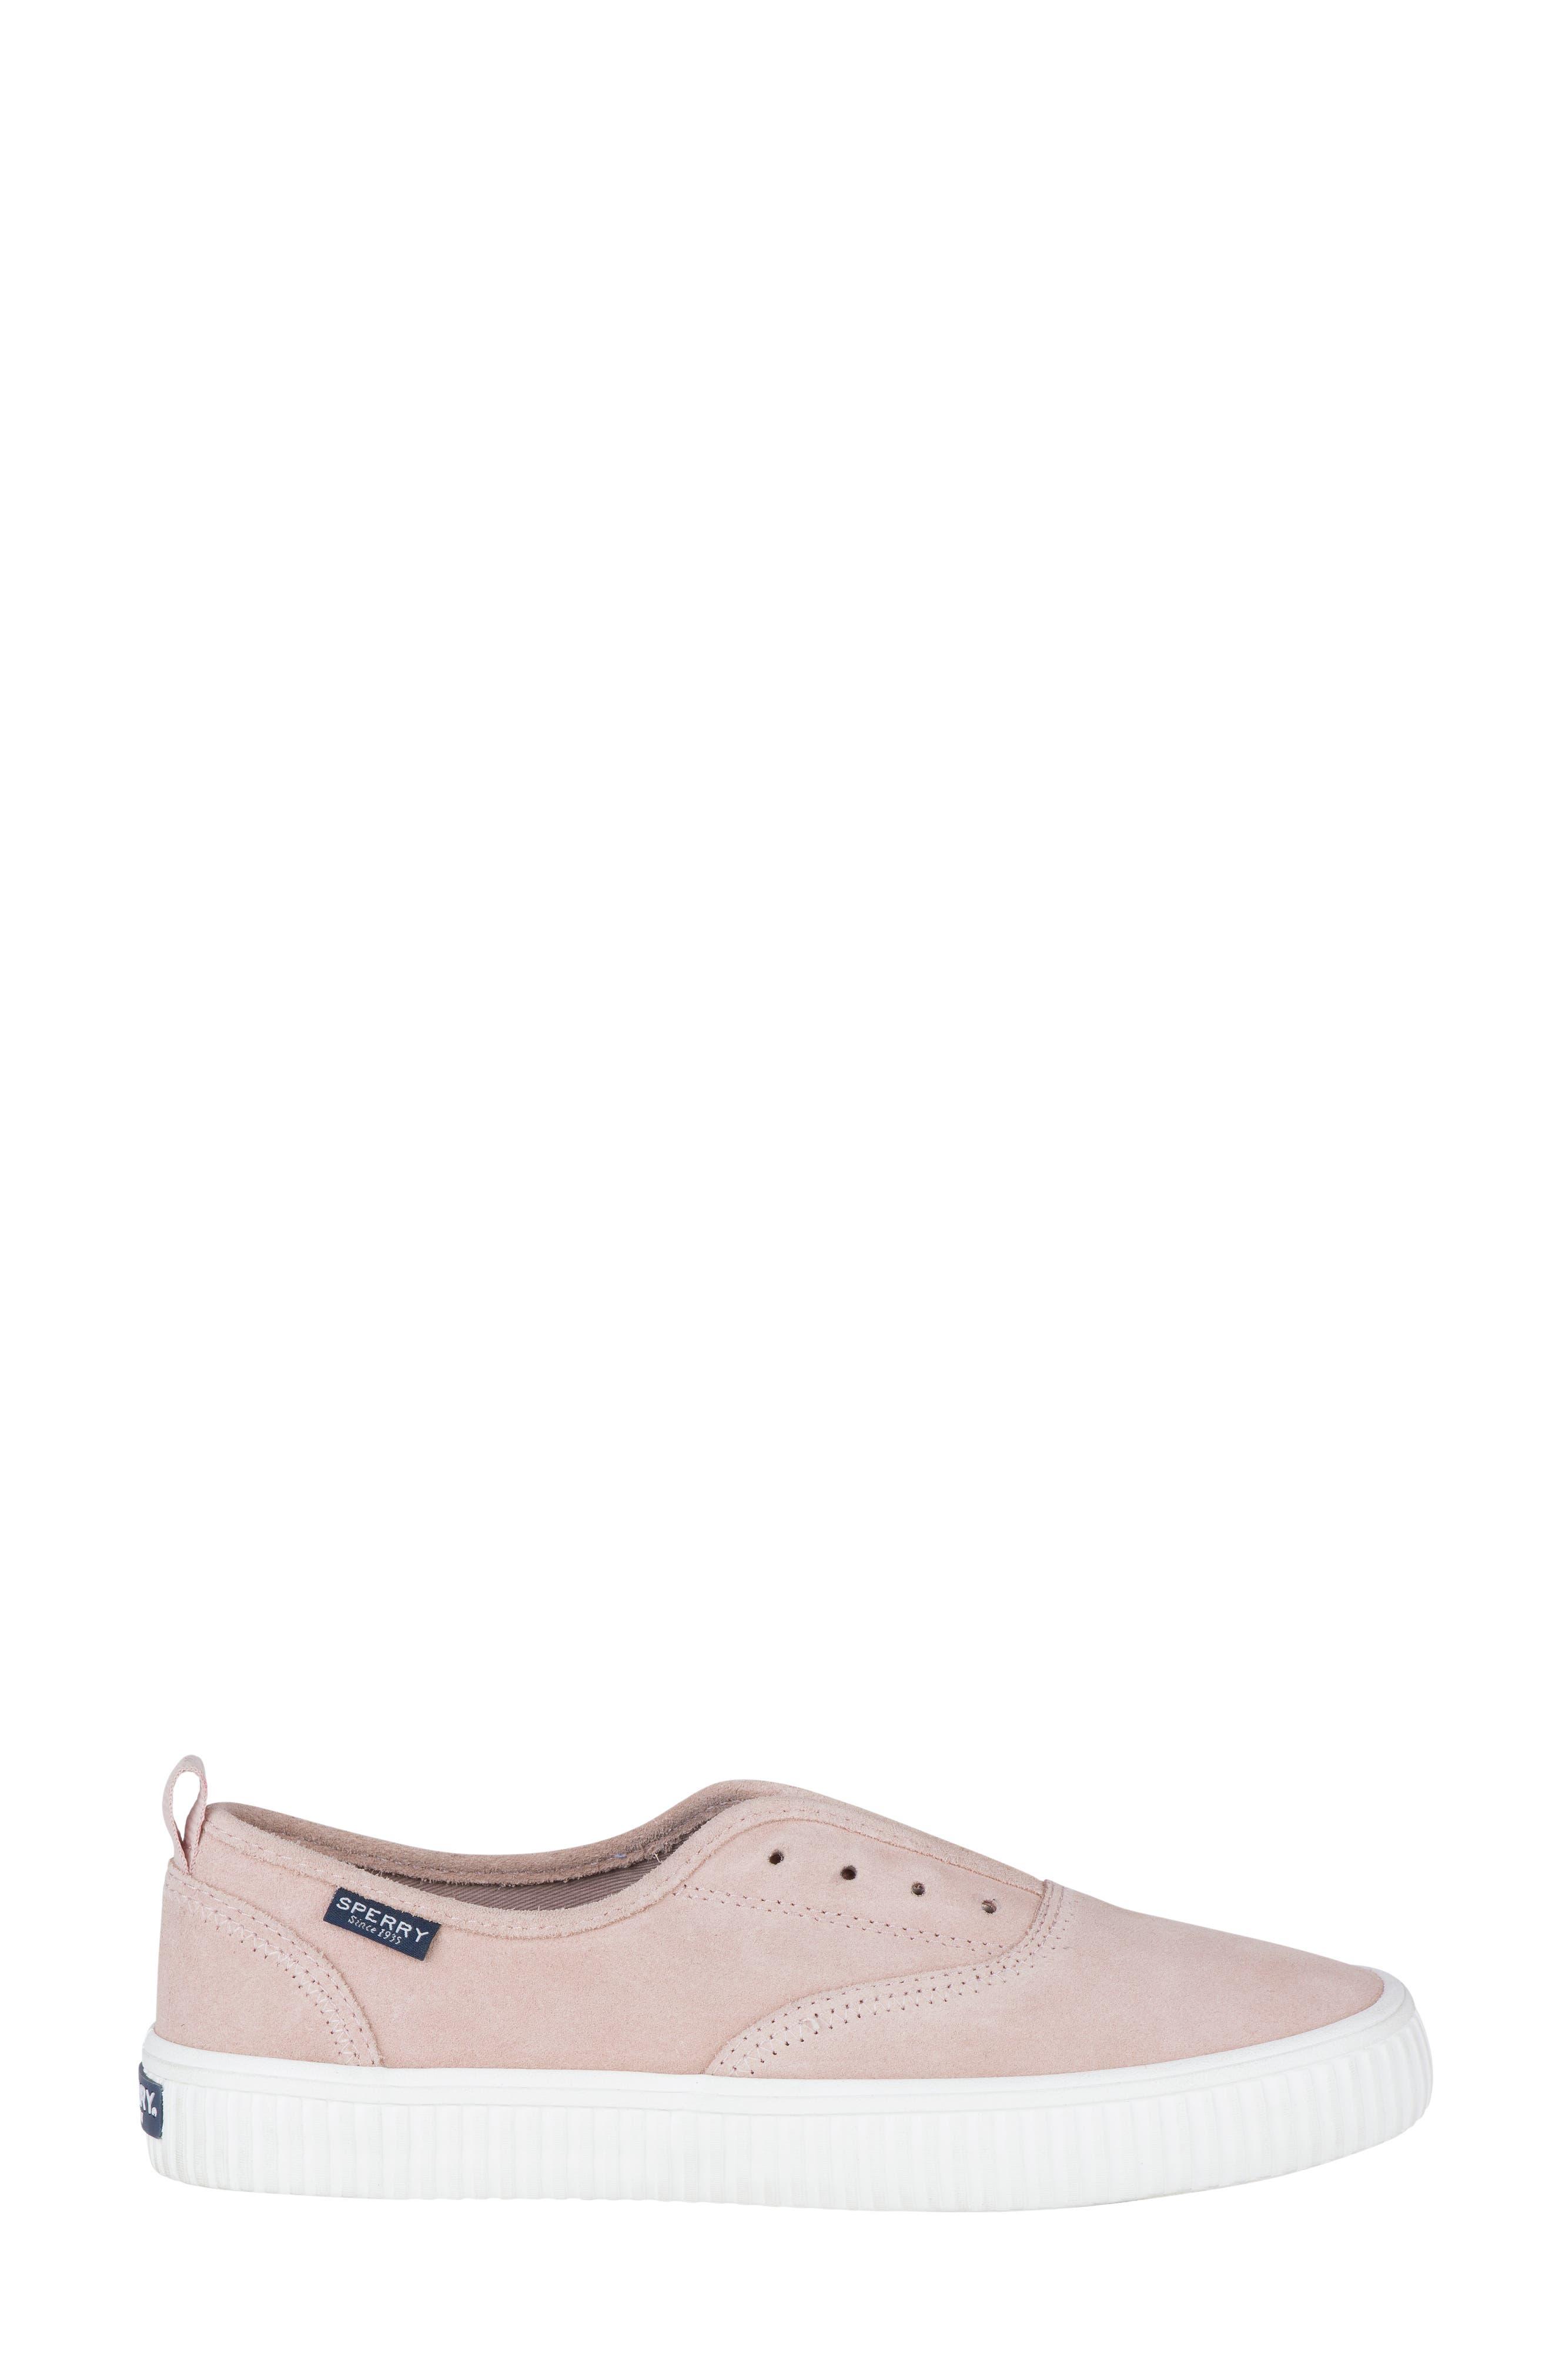 Crest Creeper Slip-On Sneaker,                             Alternate thumbnail 4, color,                             Rose Dust Suede